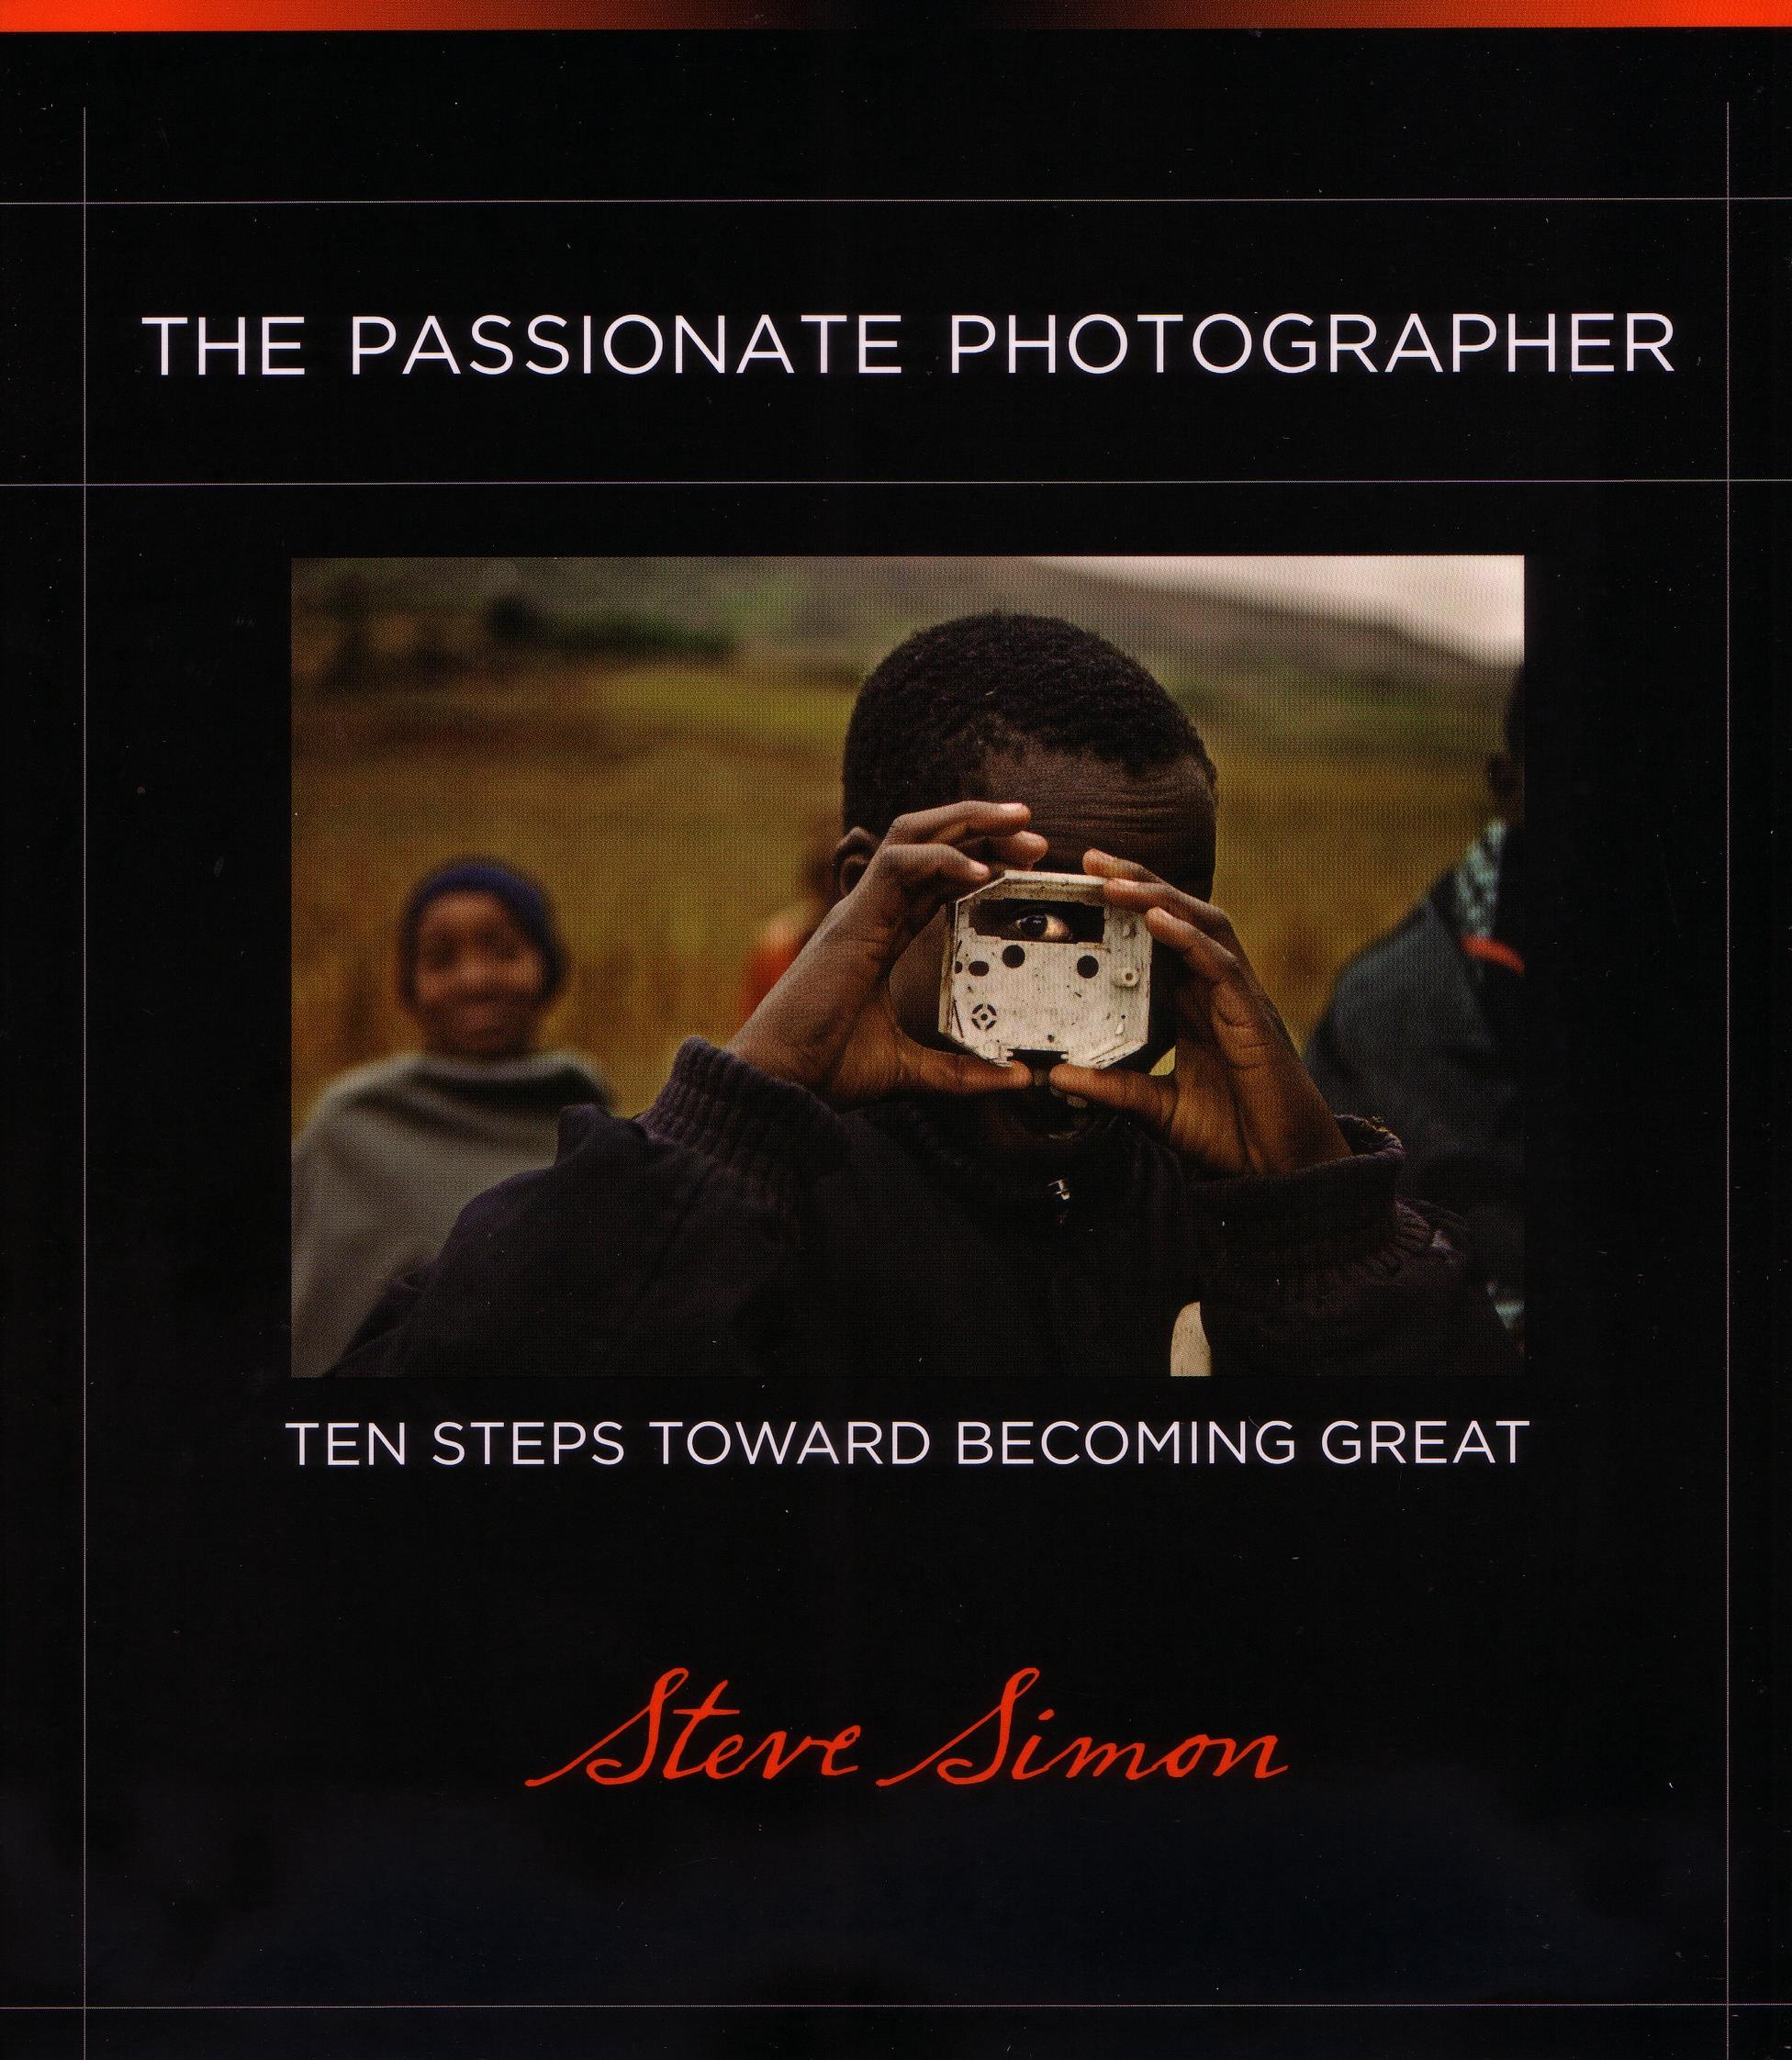 The Passionate Photographer By Steve Simon: Digital